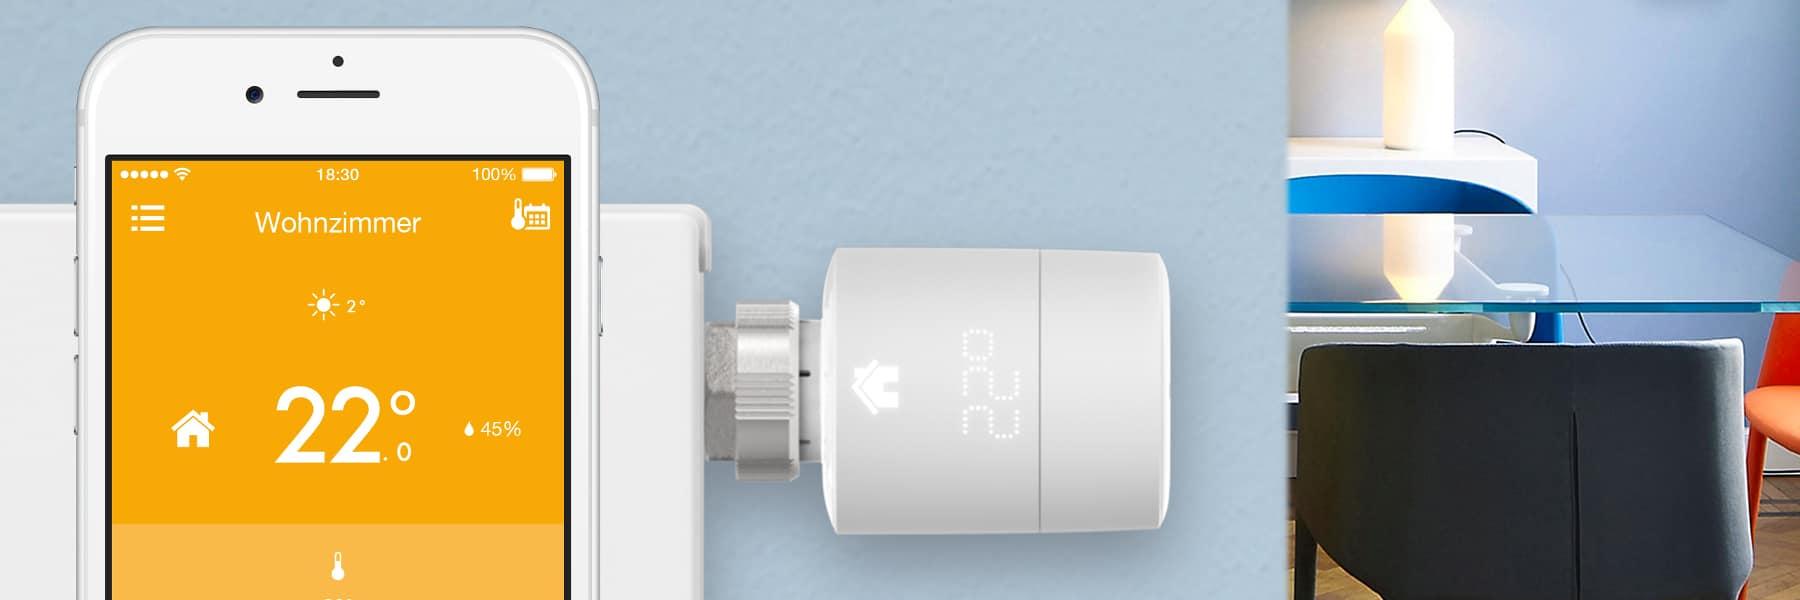 Tado: HomeKit Bridge und Heizkörperthermostate ab sofort verfügbar